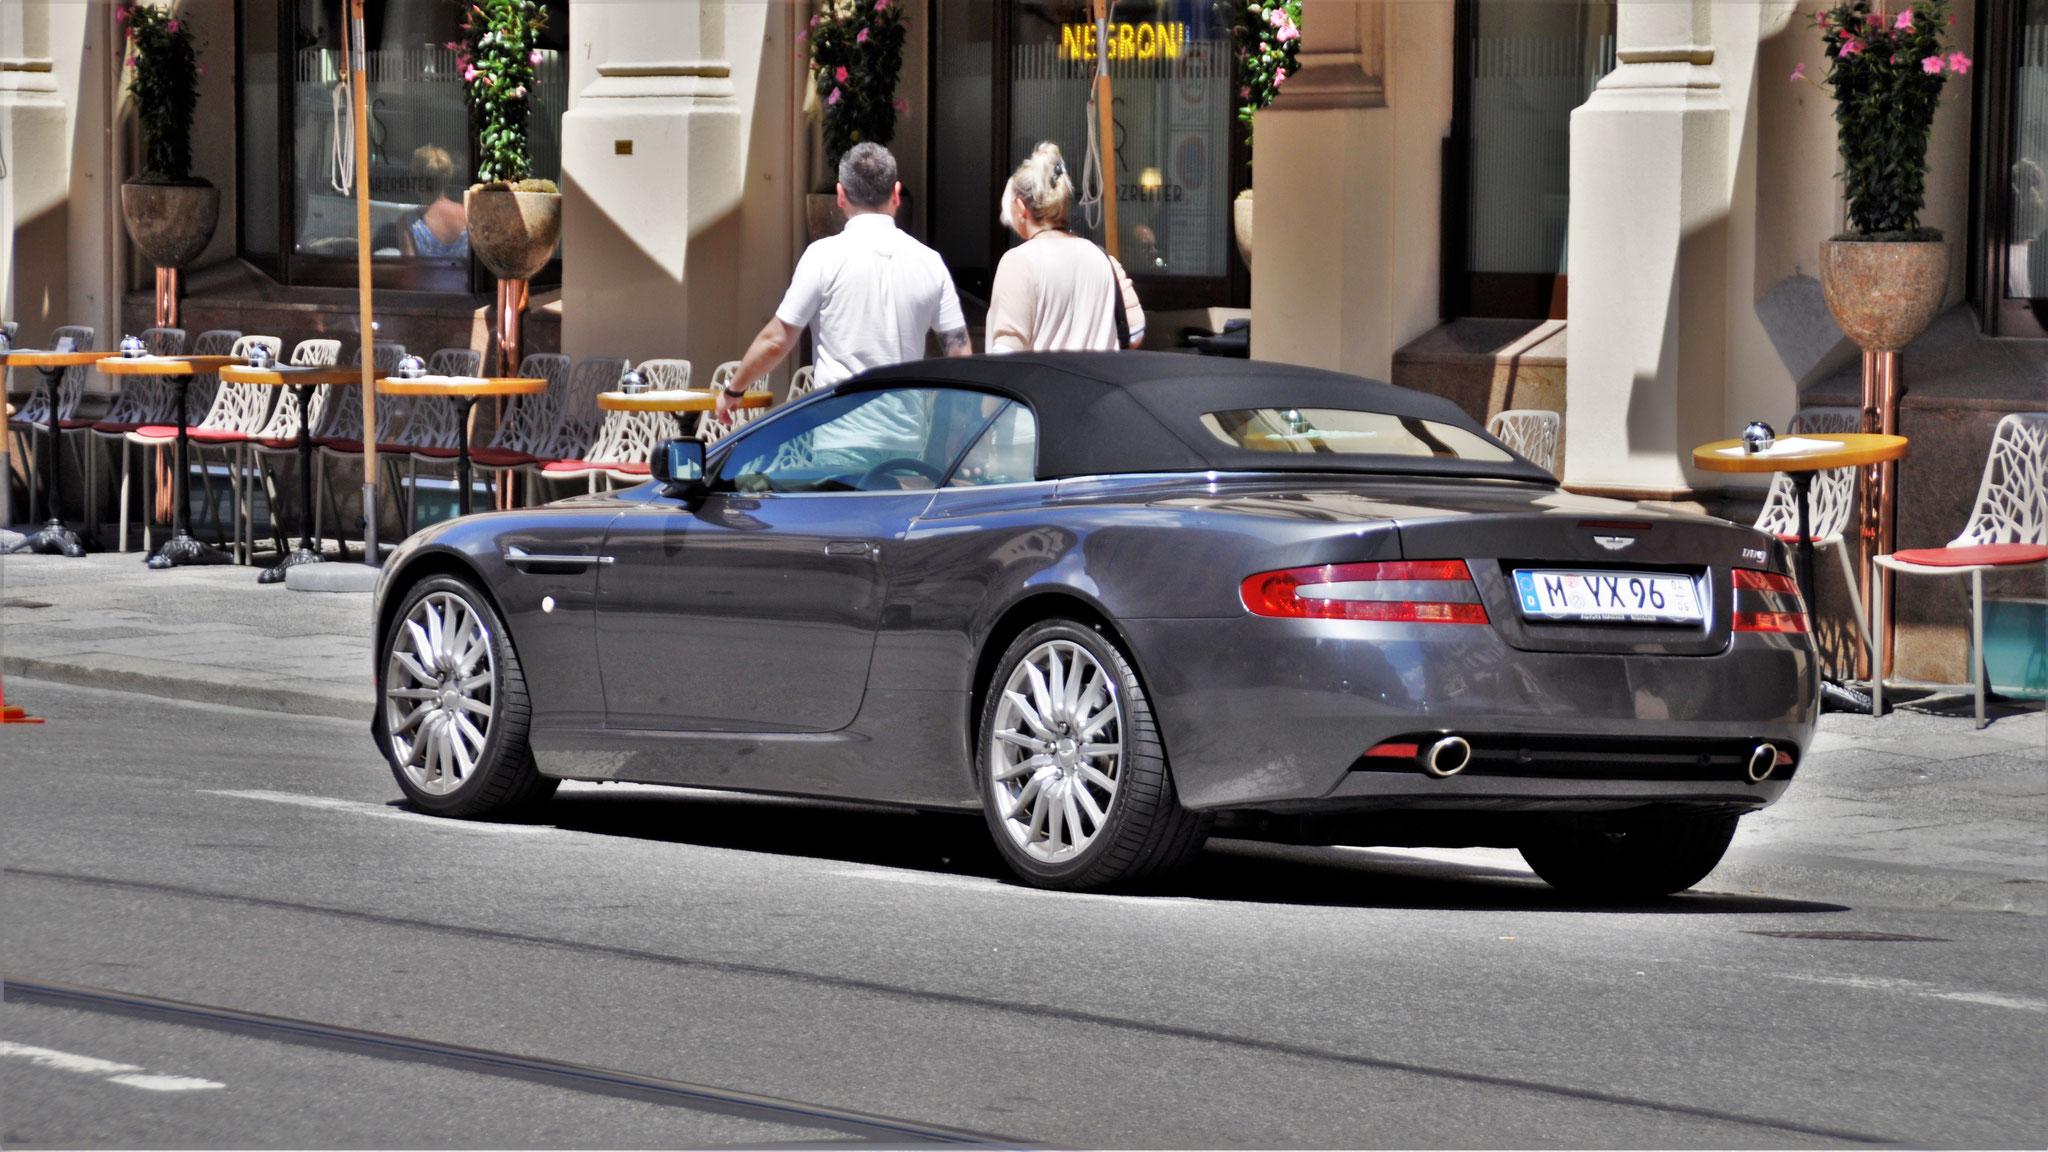 Aston Martin DB9 Volante - M-YX-96